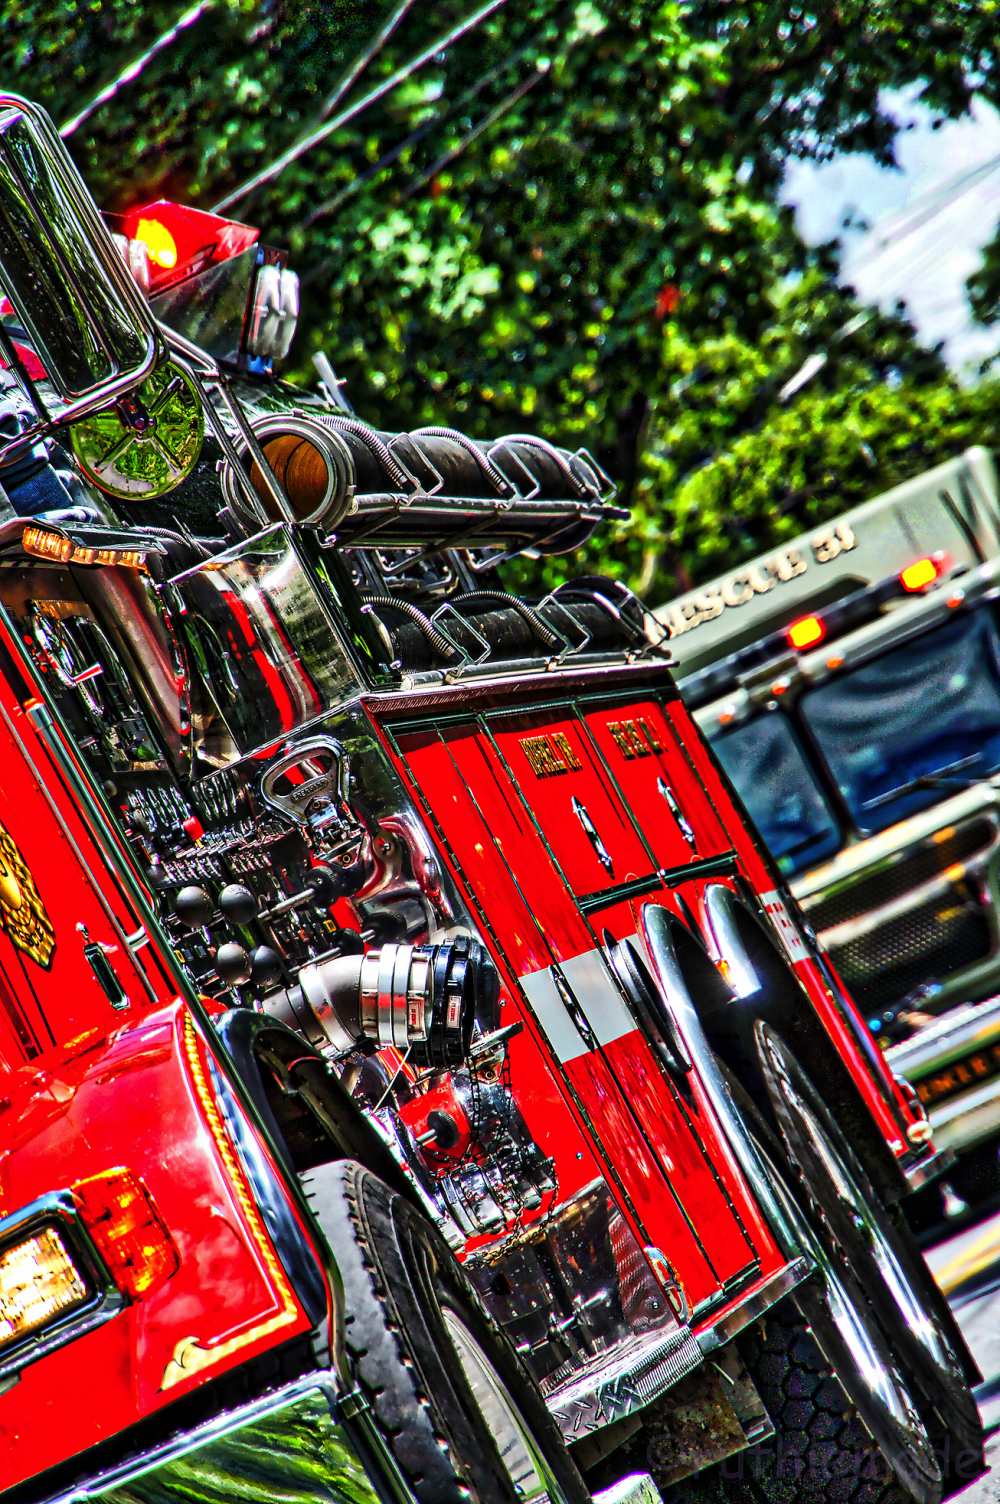 Firetruck on Parade